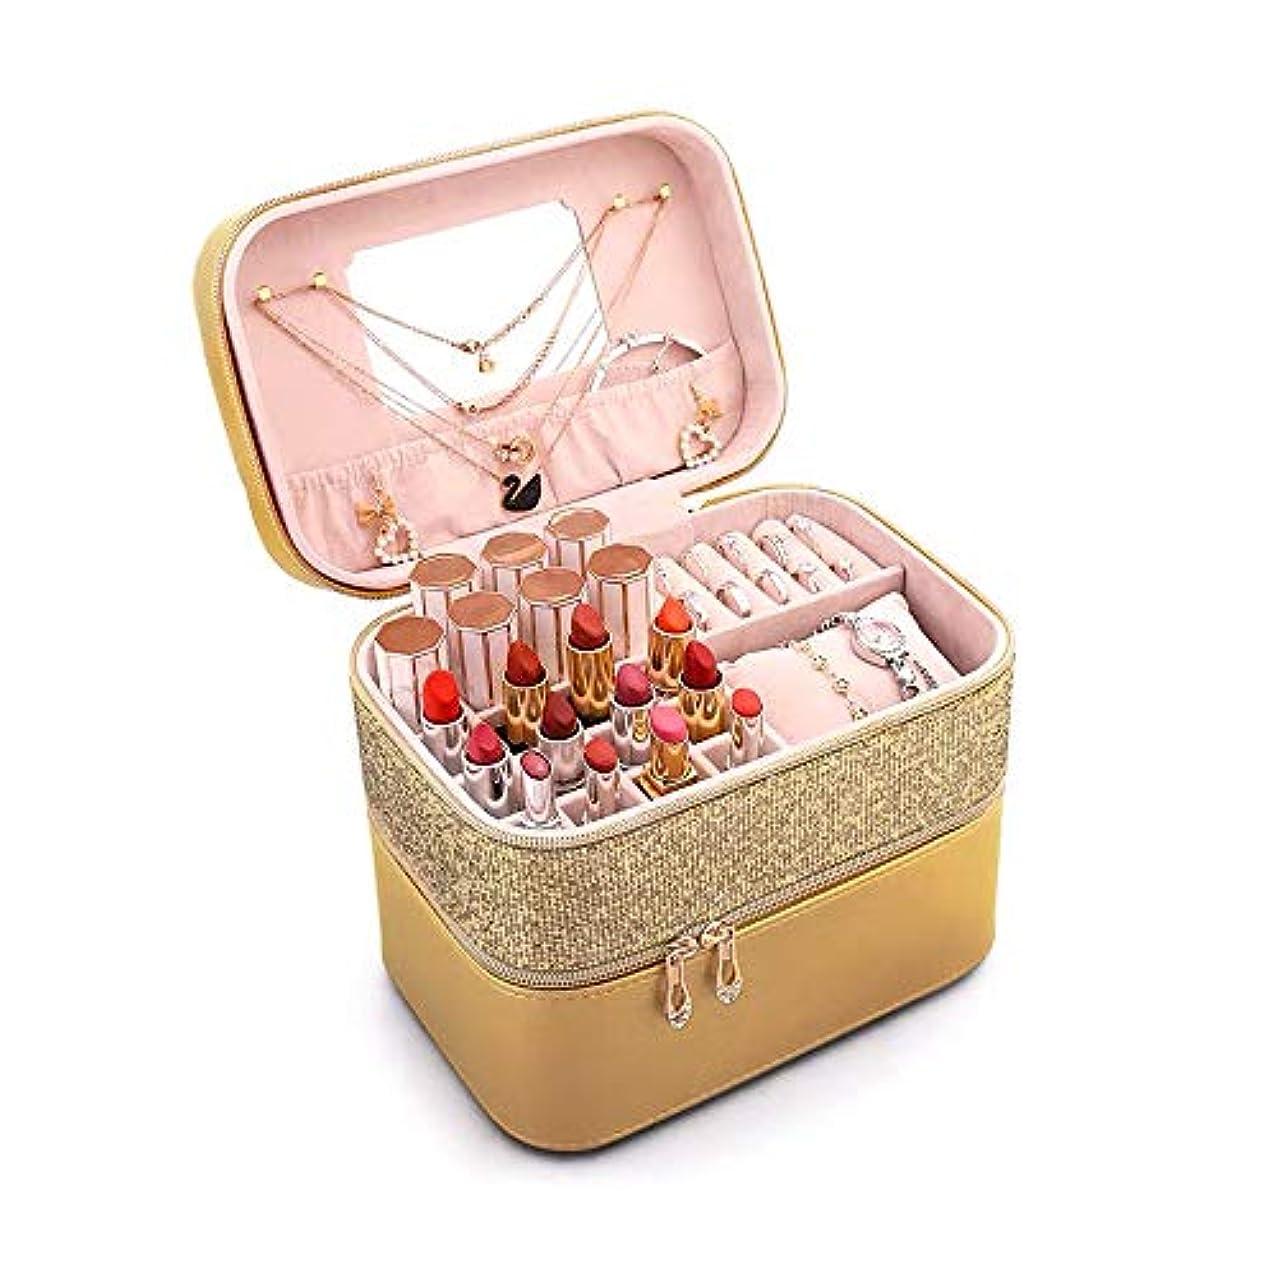 SZTulip メイクボックス 化粧品収納ボックス メイクケース コスメボックス 口紅など小物入れ アクセサリー収納 大容量鏡付き (シャンペン)